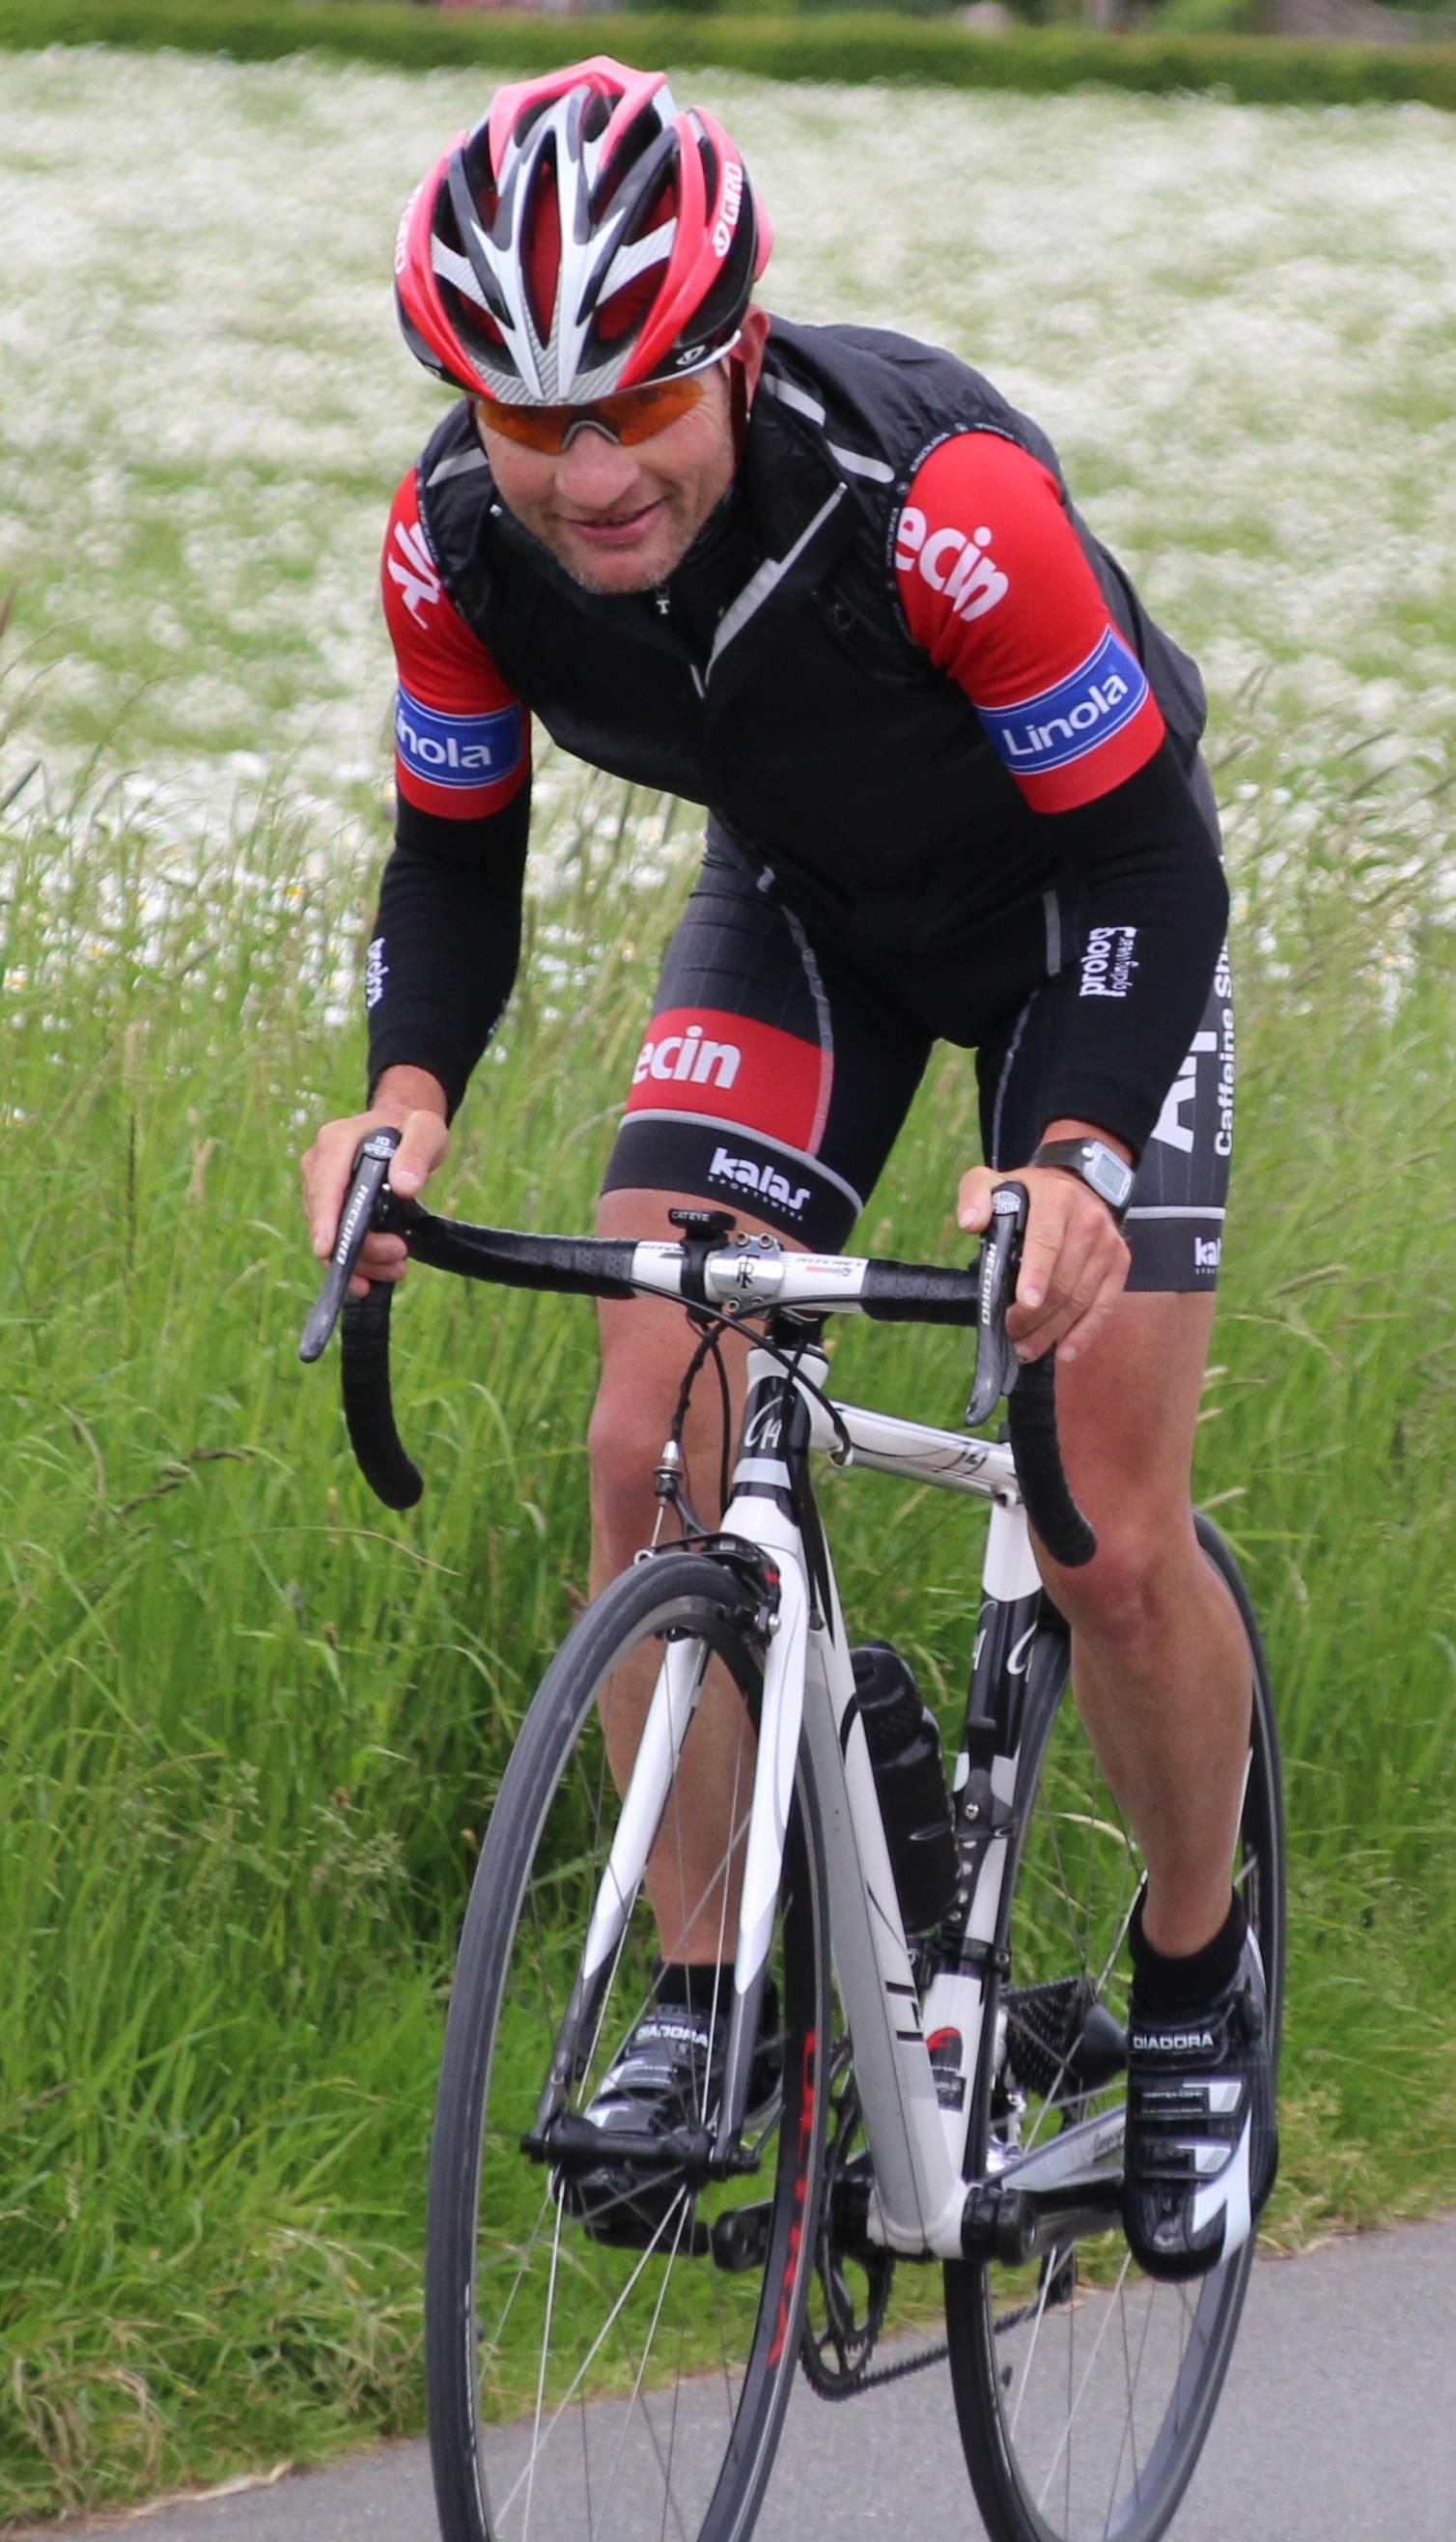 Kai Uwe Wallenhorst